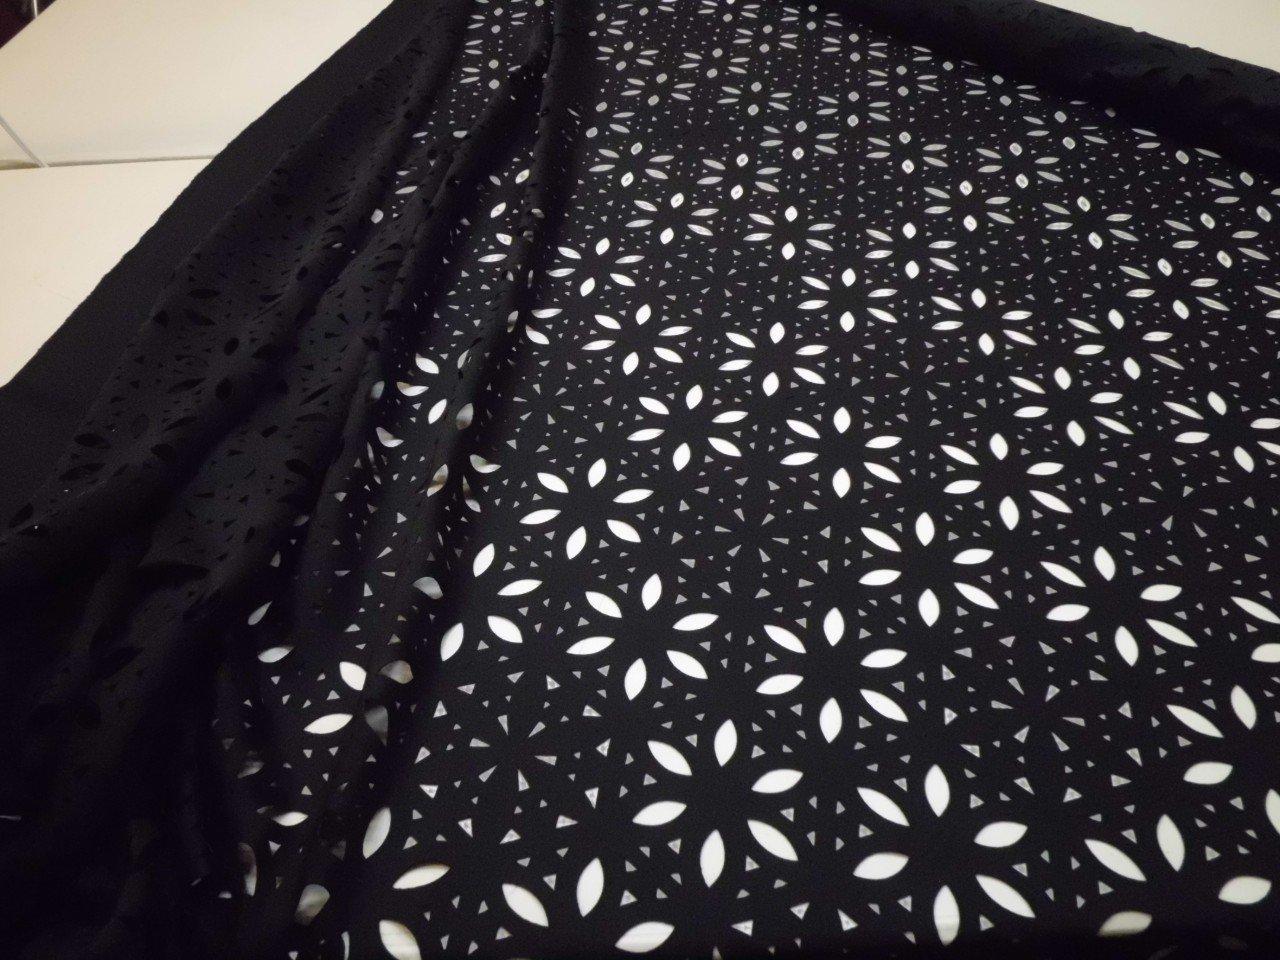 Trina Turk Laser Cut Scuba Knit in Black